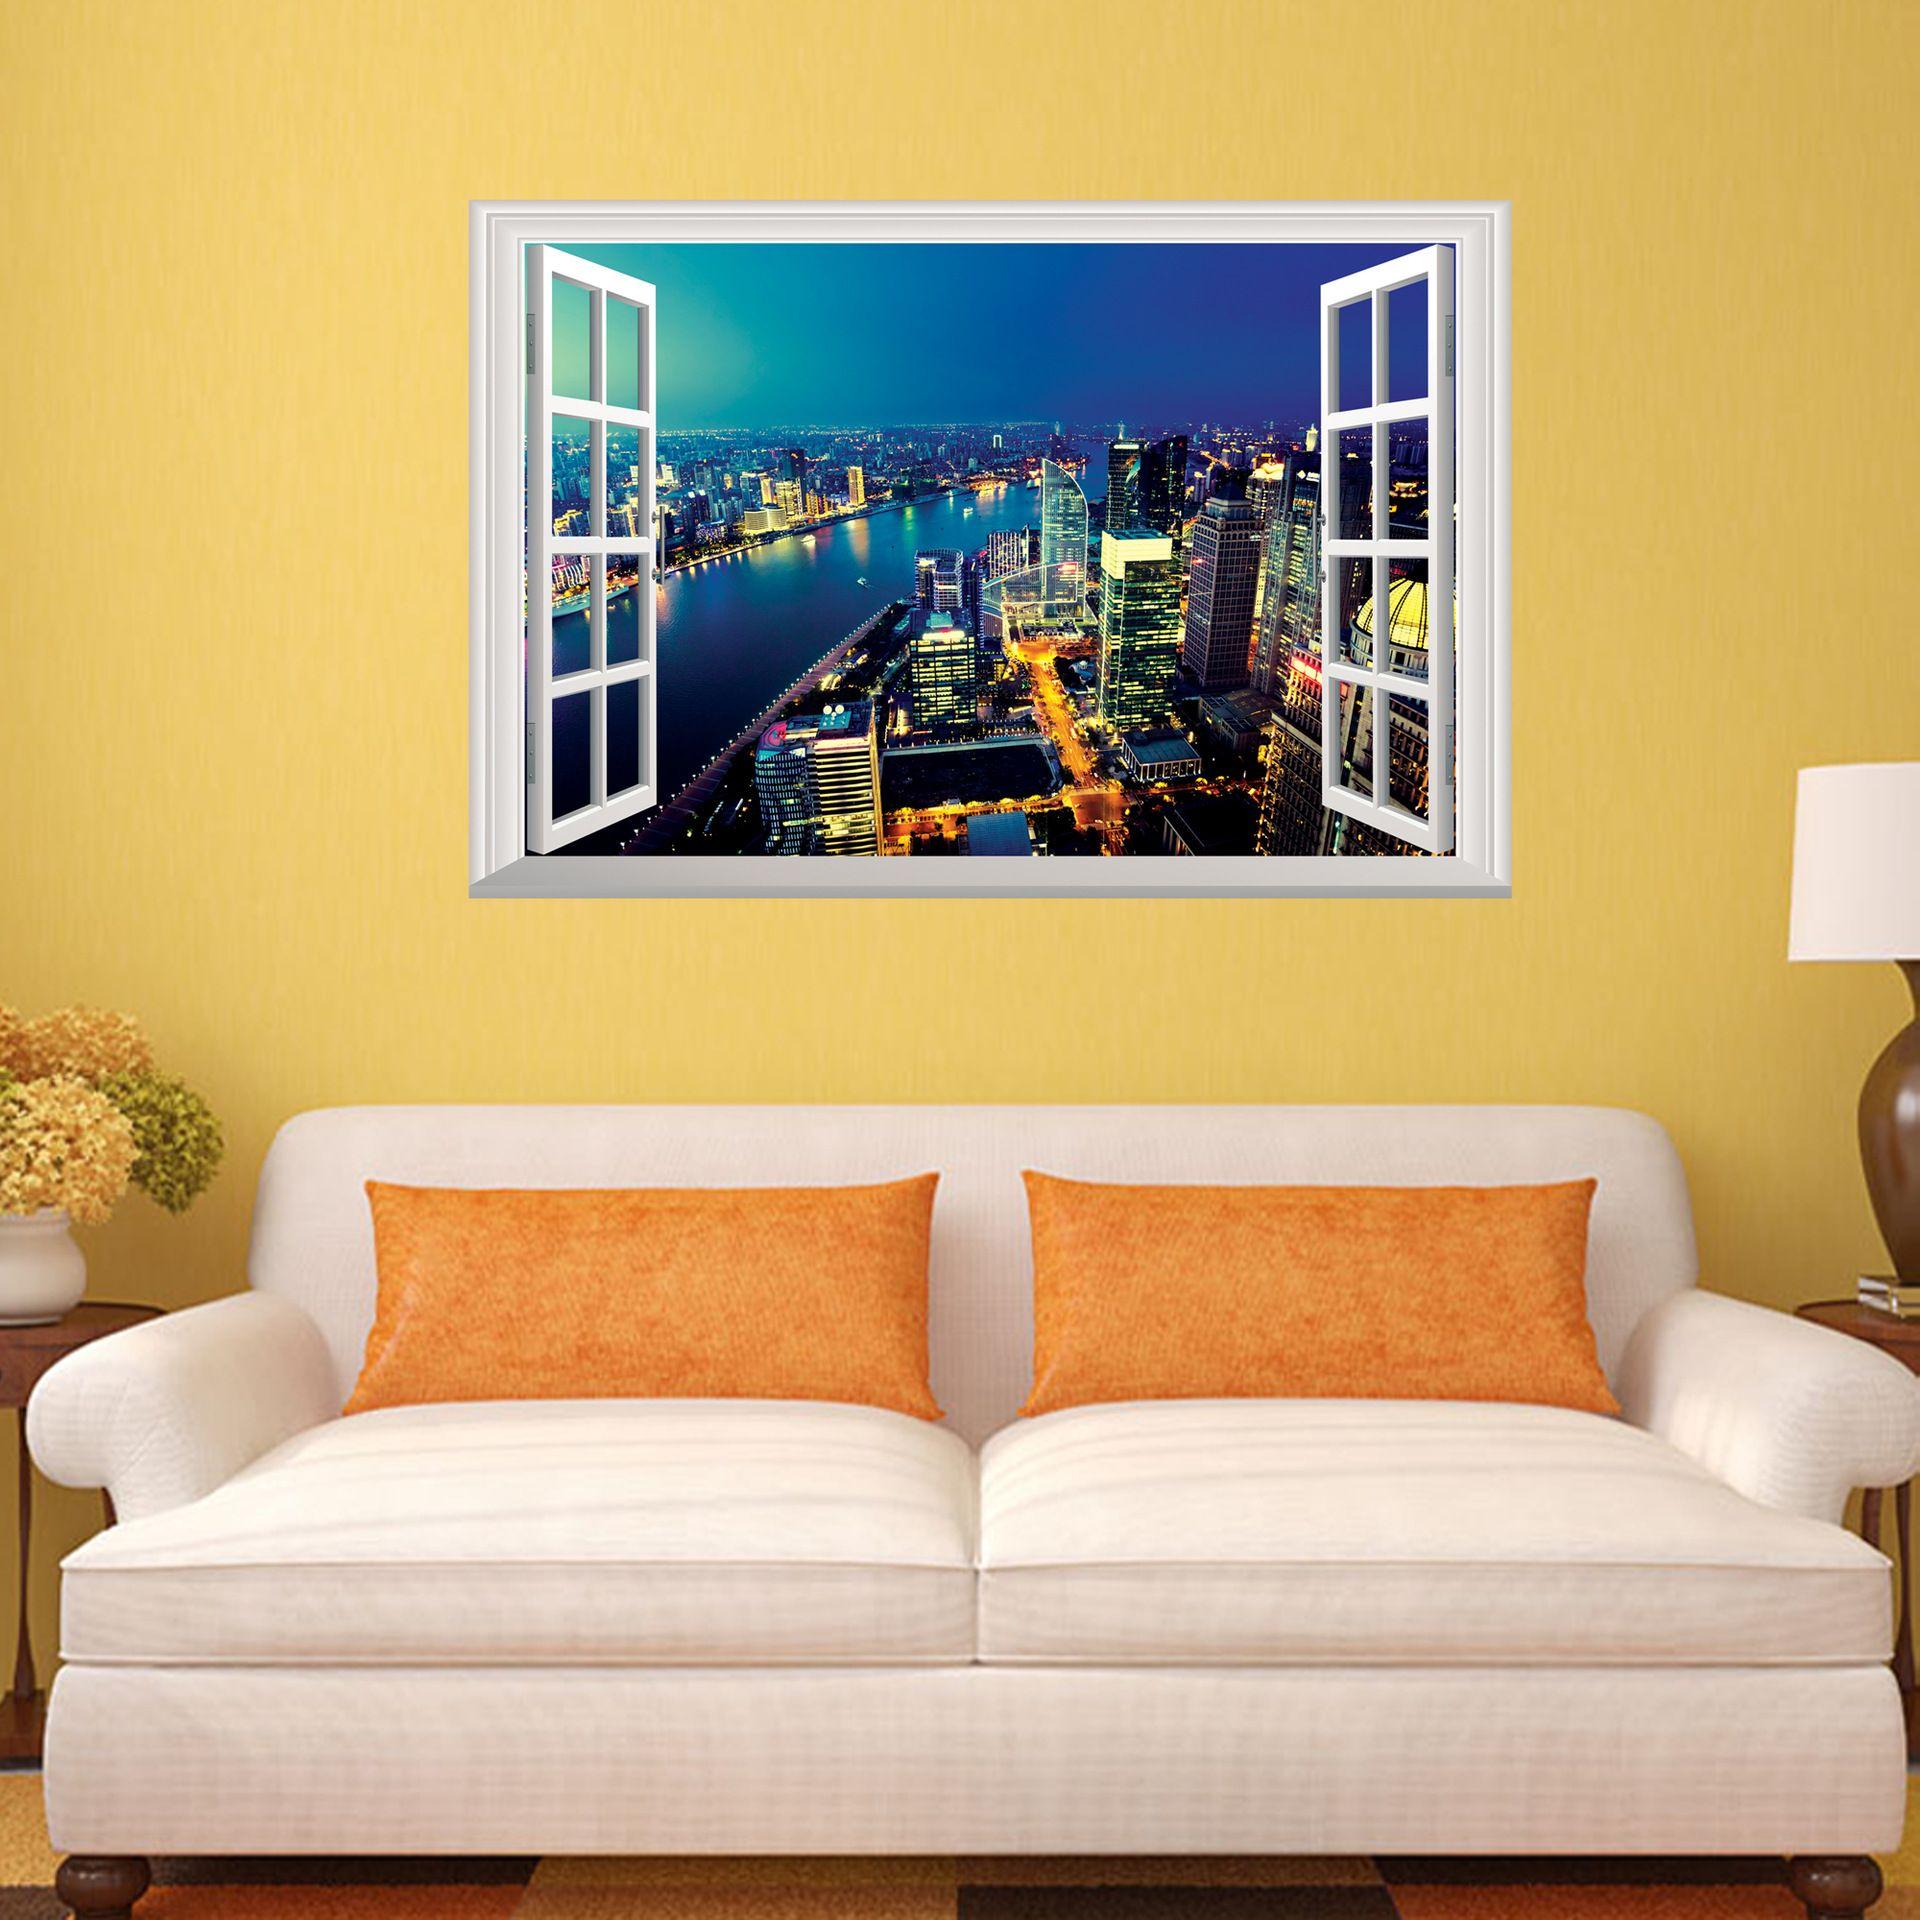 prosperous 3D Wall Sticker Removable Window View Landscape Wallpaper Home Decor  CQ-103